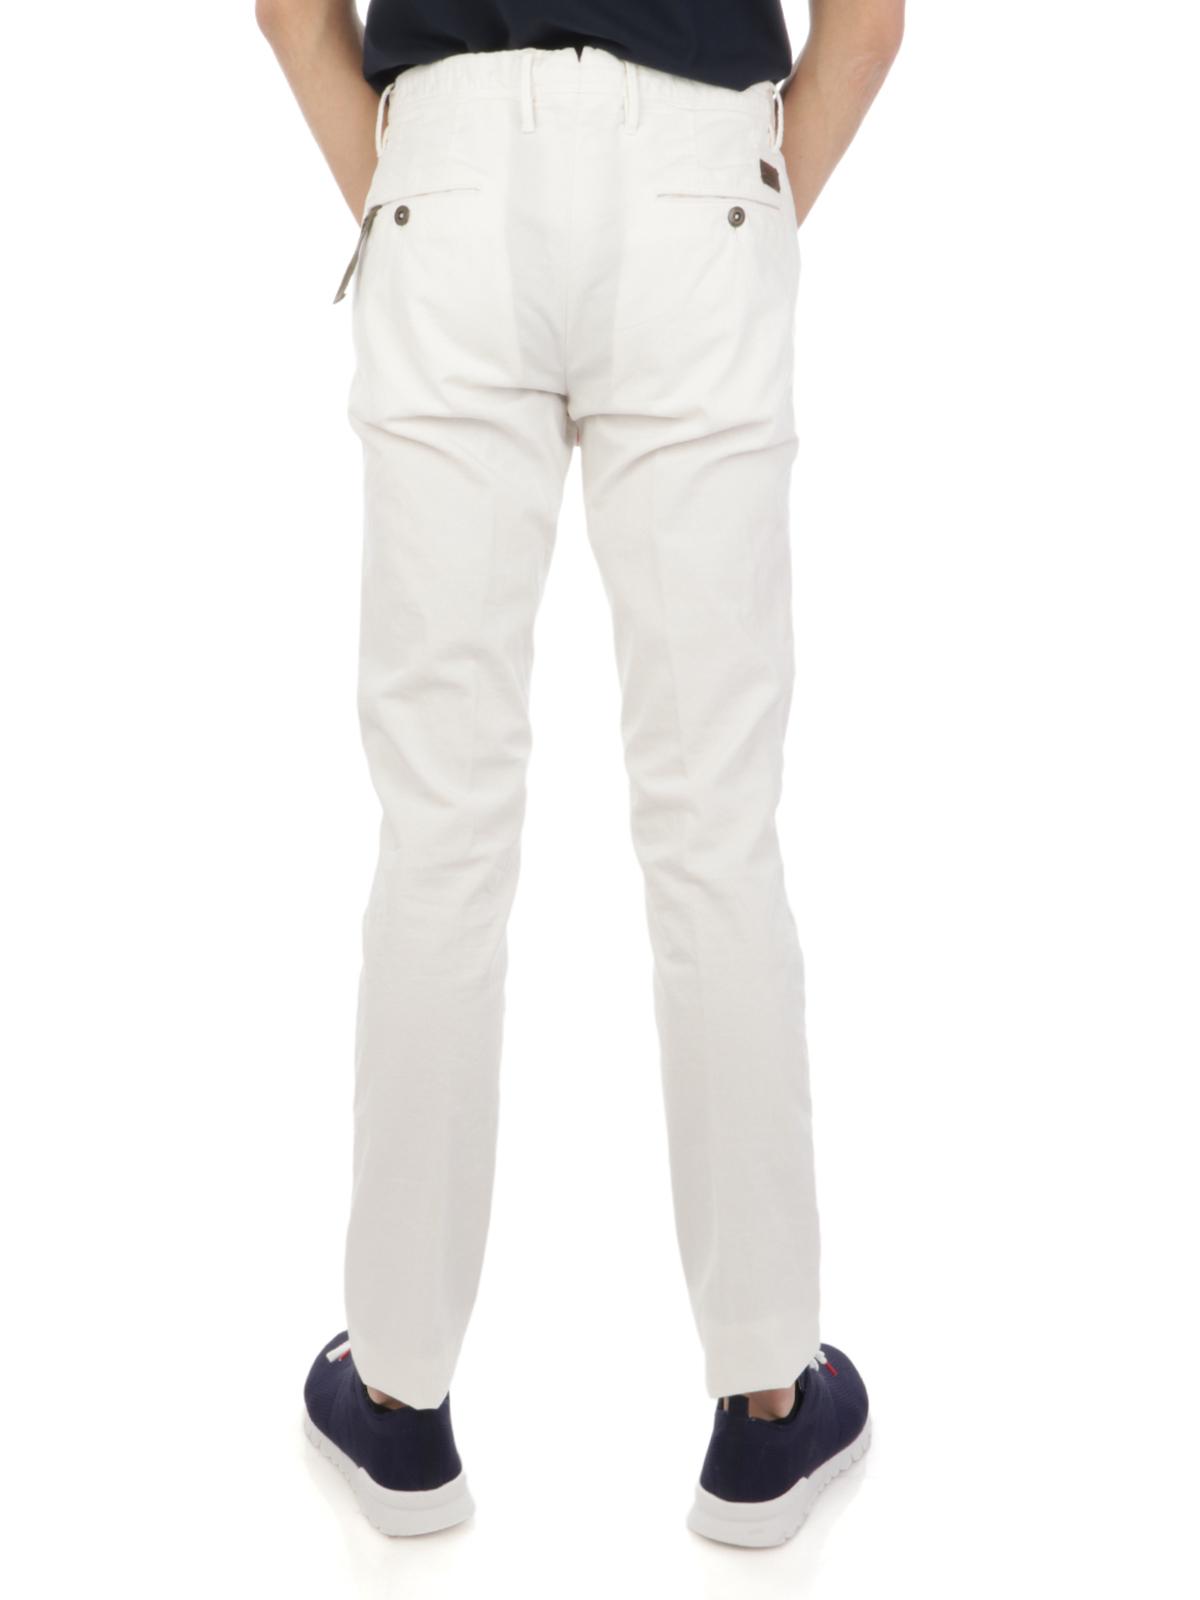 Immagine di INCOTEX | Pantaloni Chino Uomo Slacks